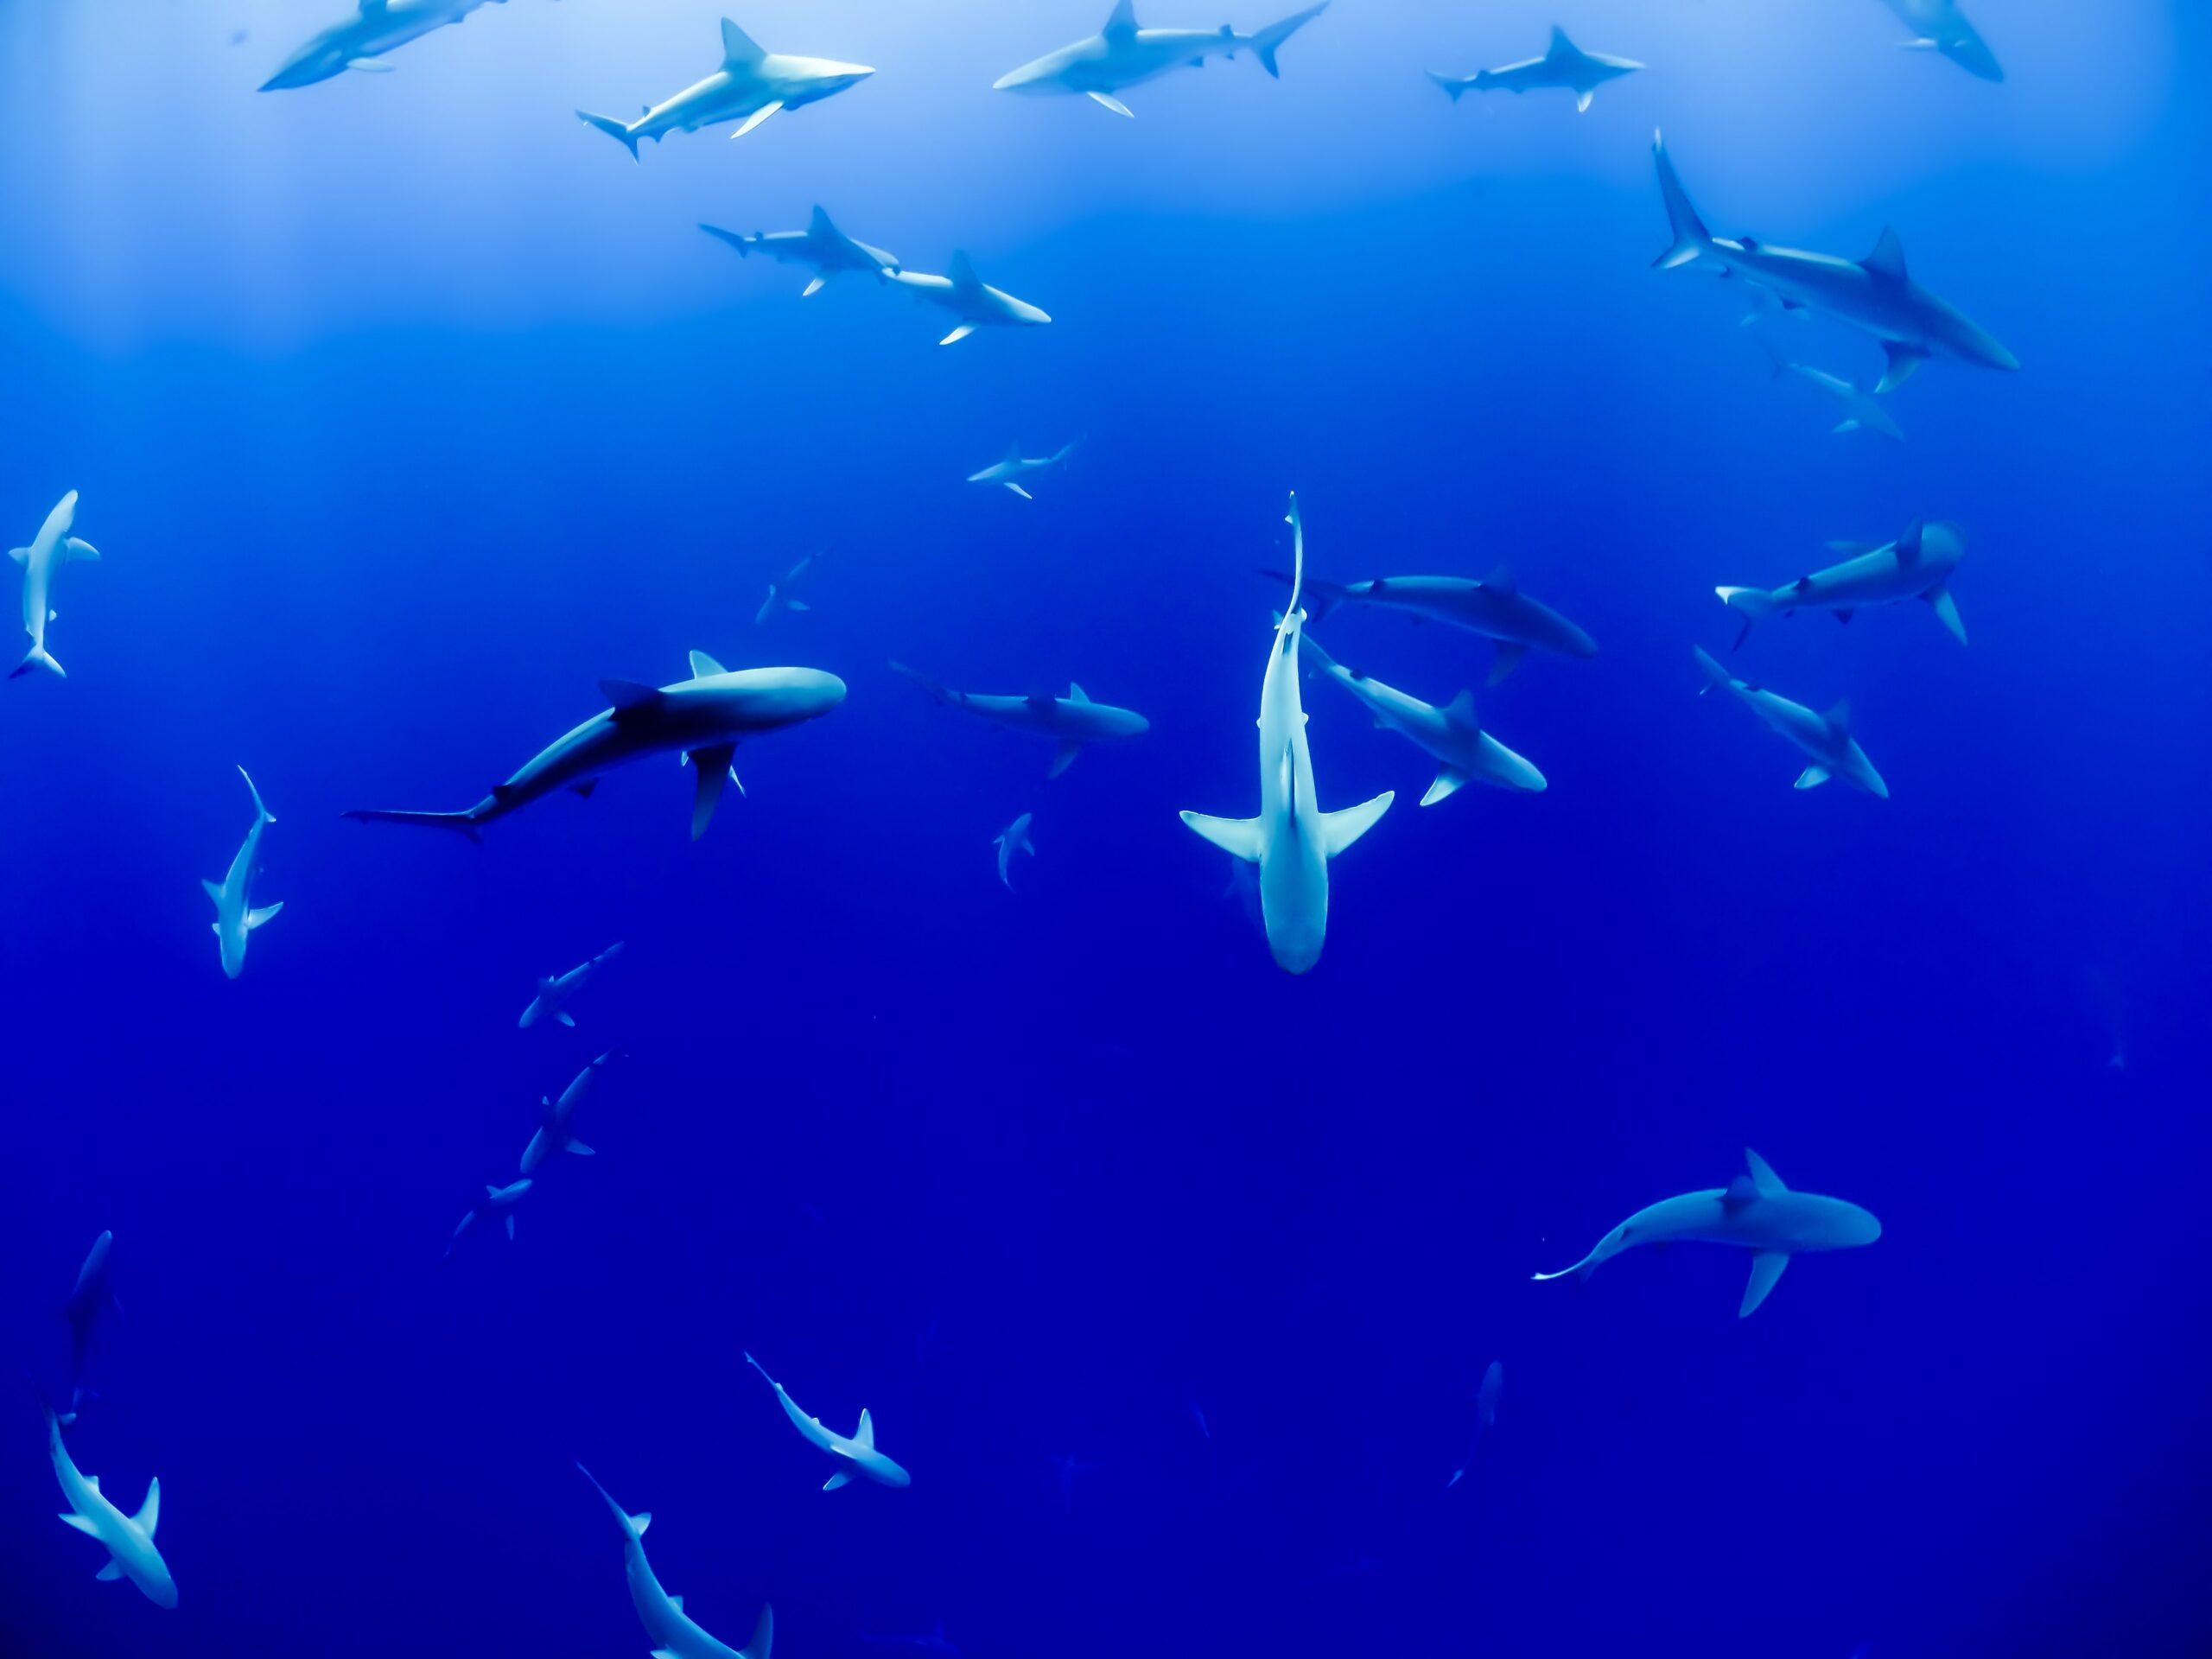 Dozens of Costa Rica Shark Species Designated as 'Endangered'